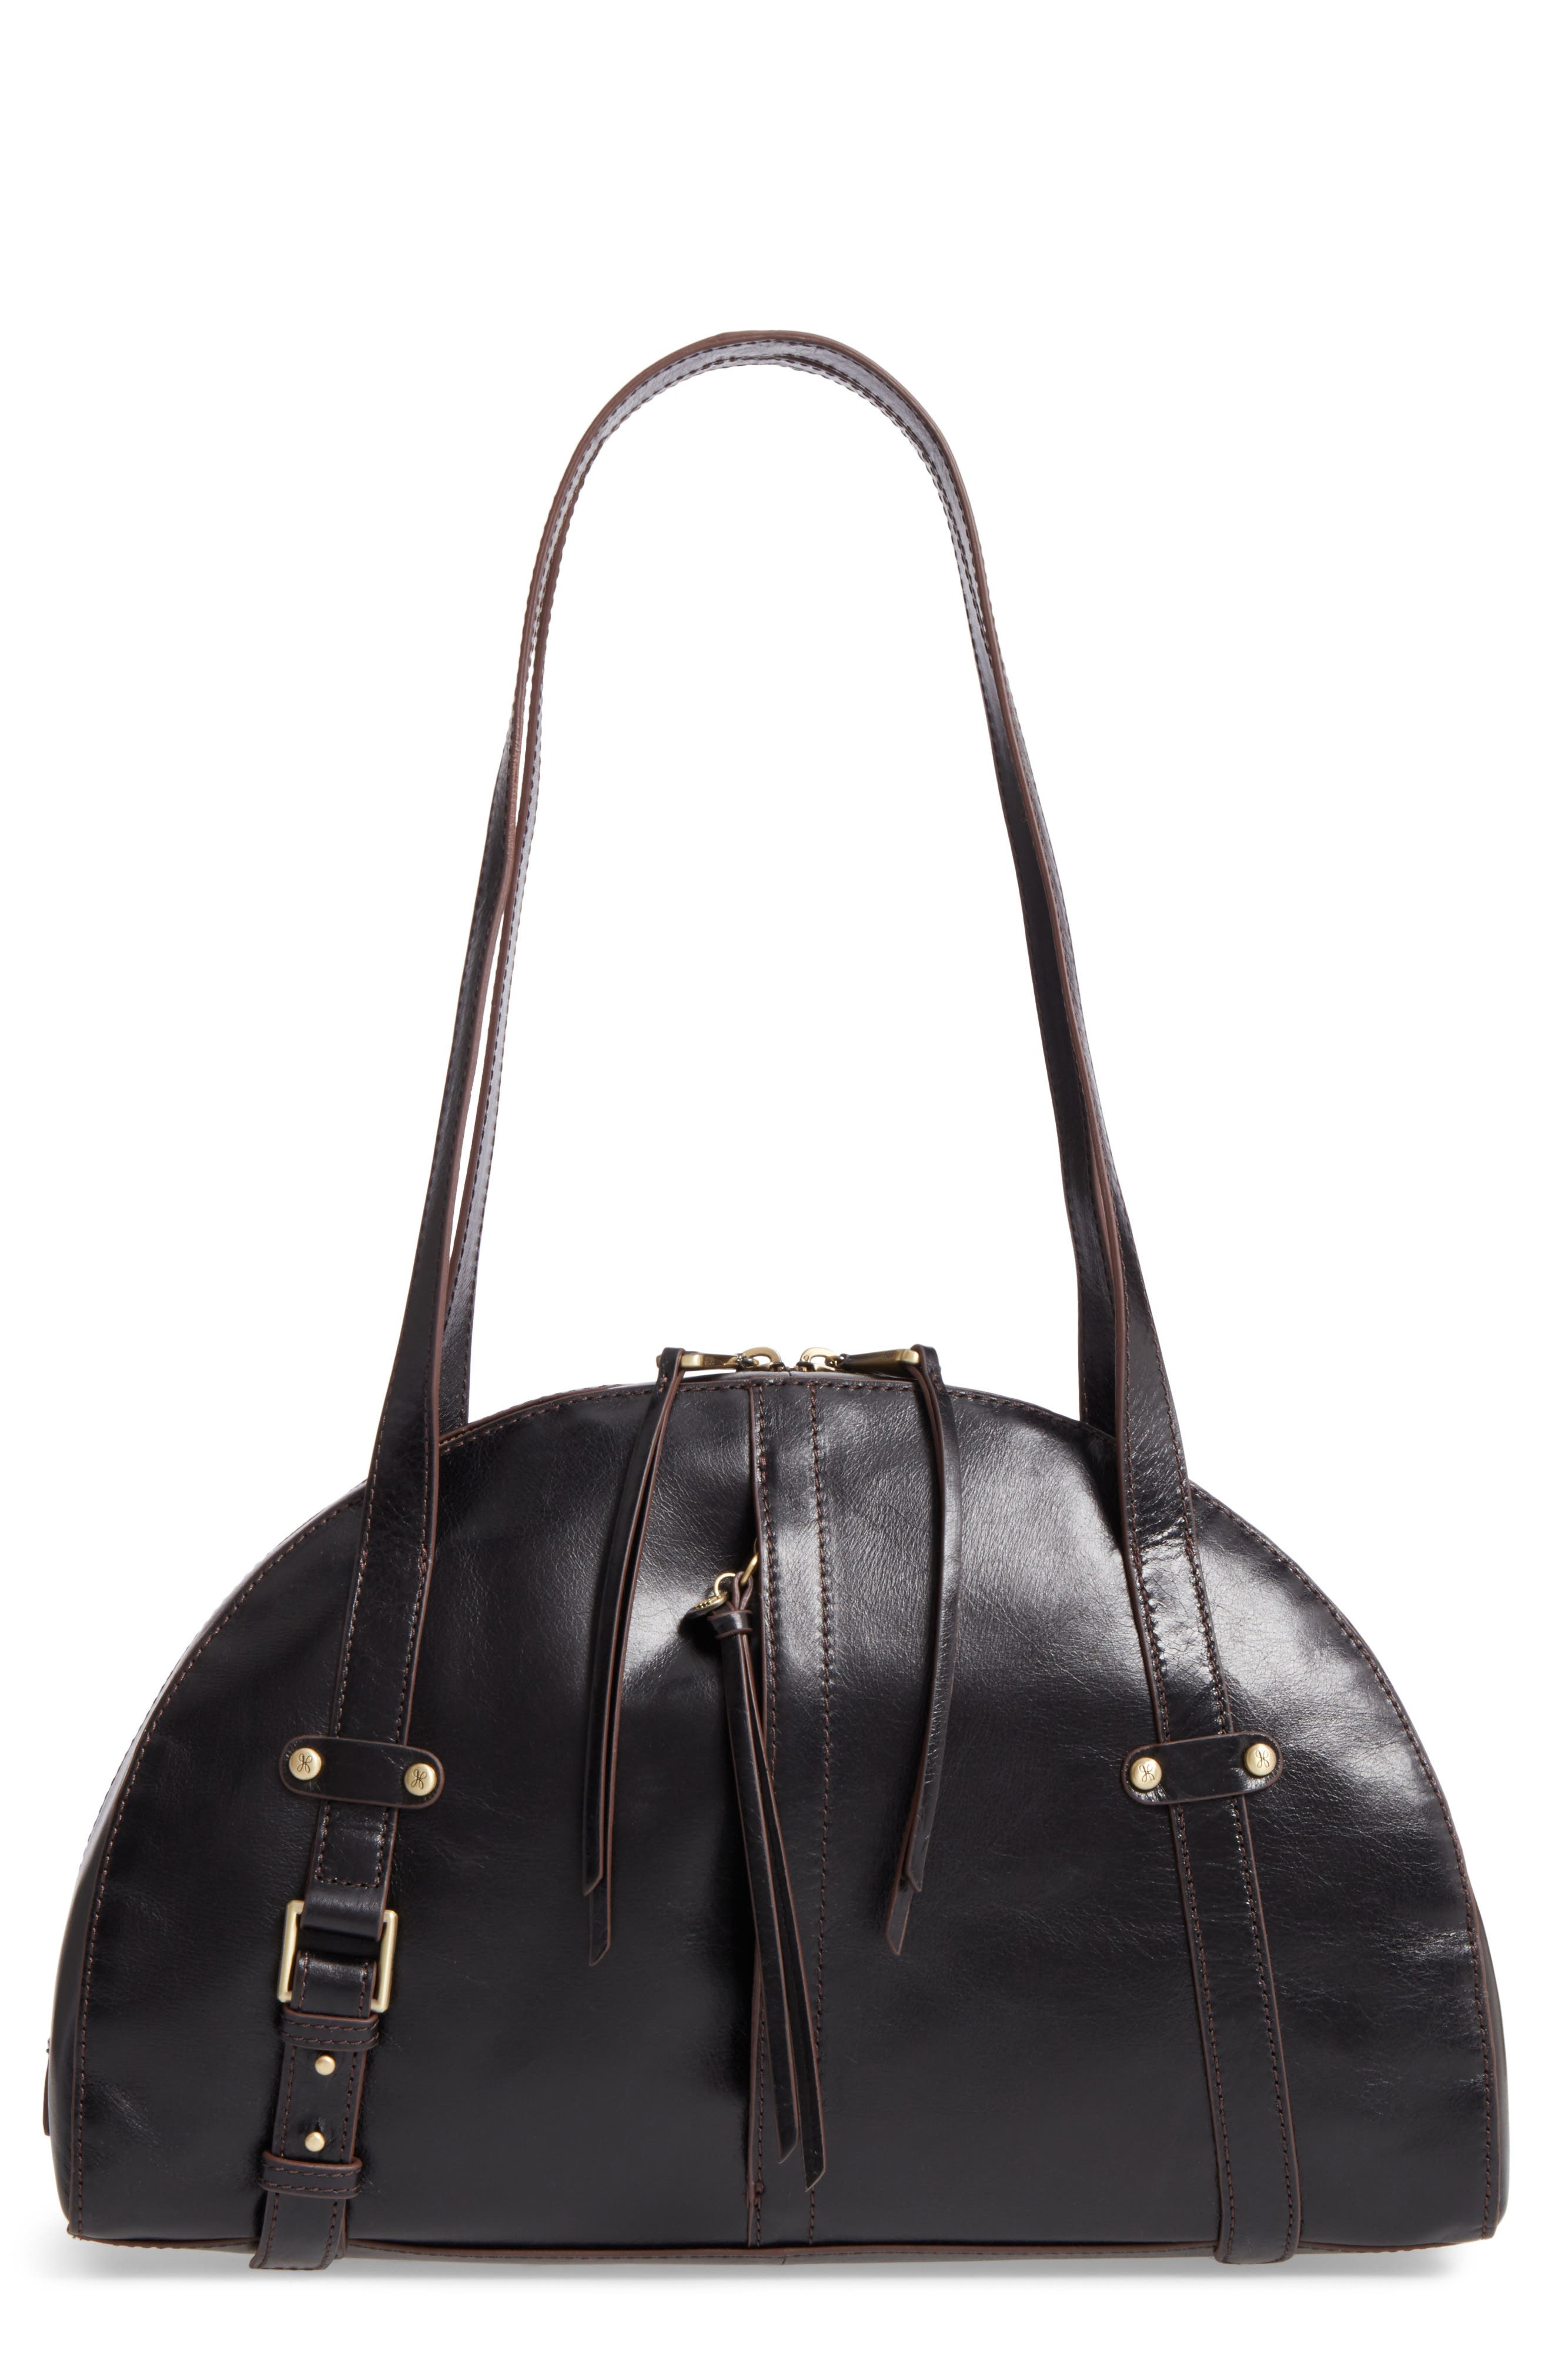 Hobo Beckon Calfskin Leather Satchel